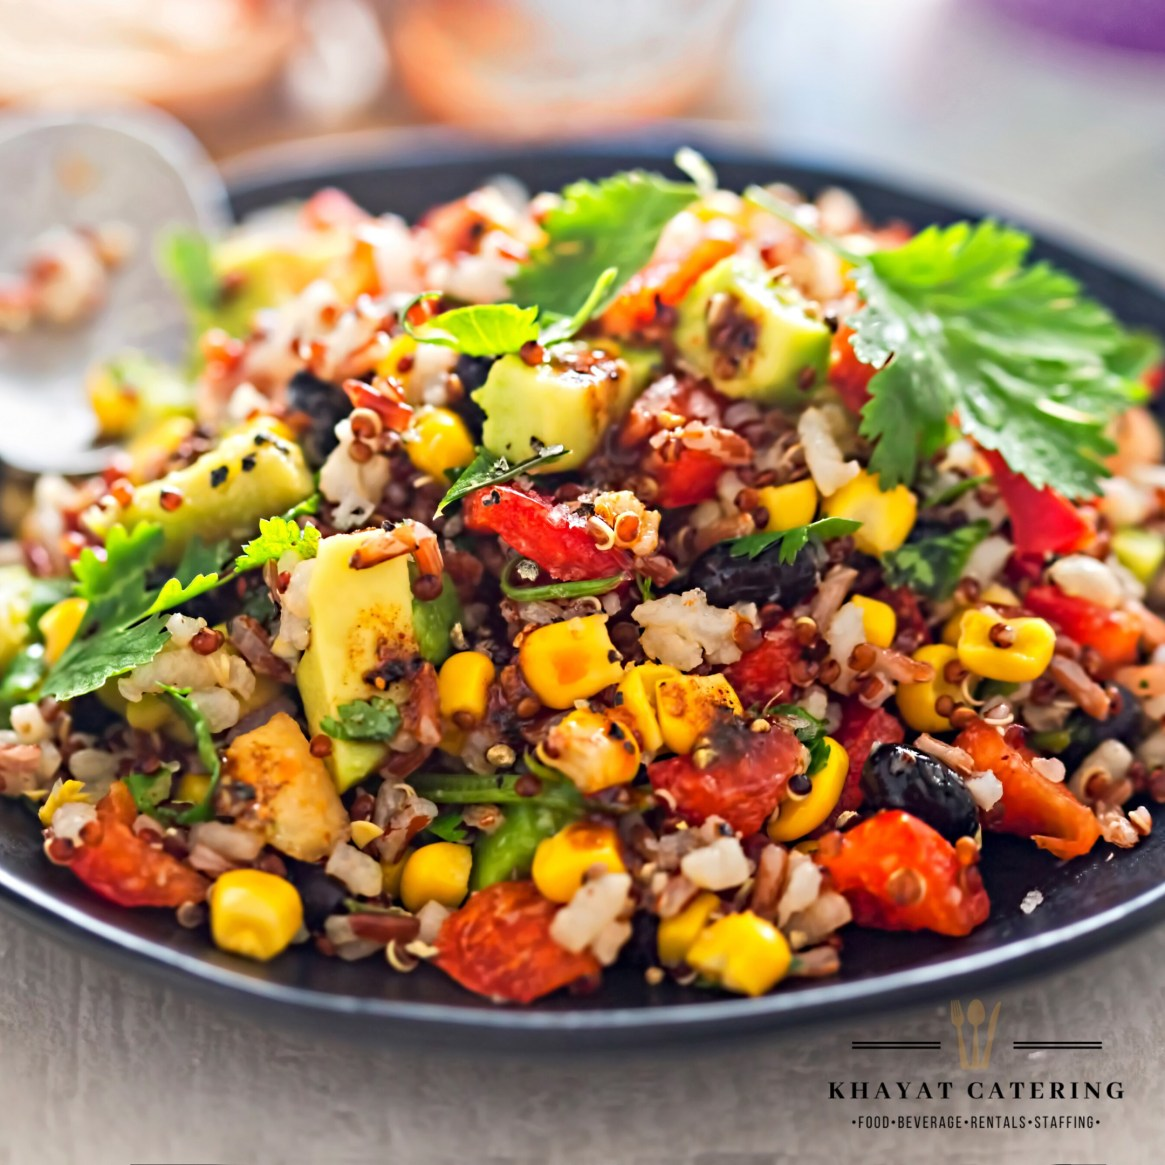 Khayat Catering roasted corn and black bean salad